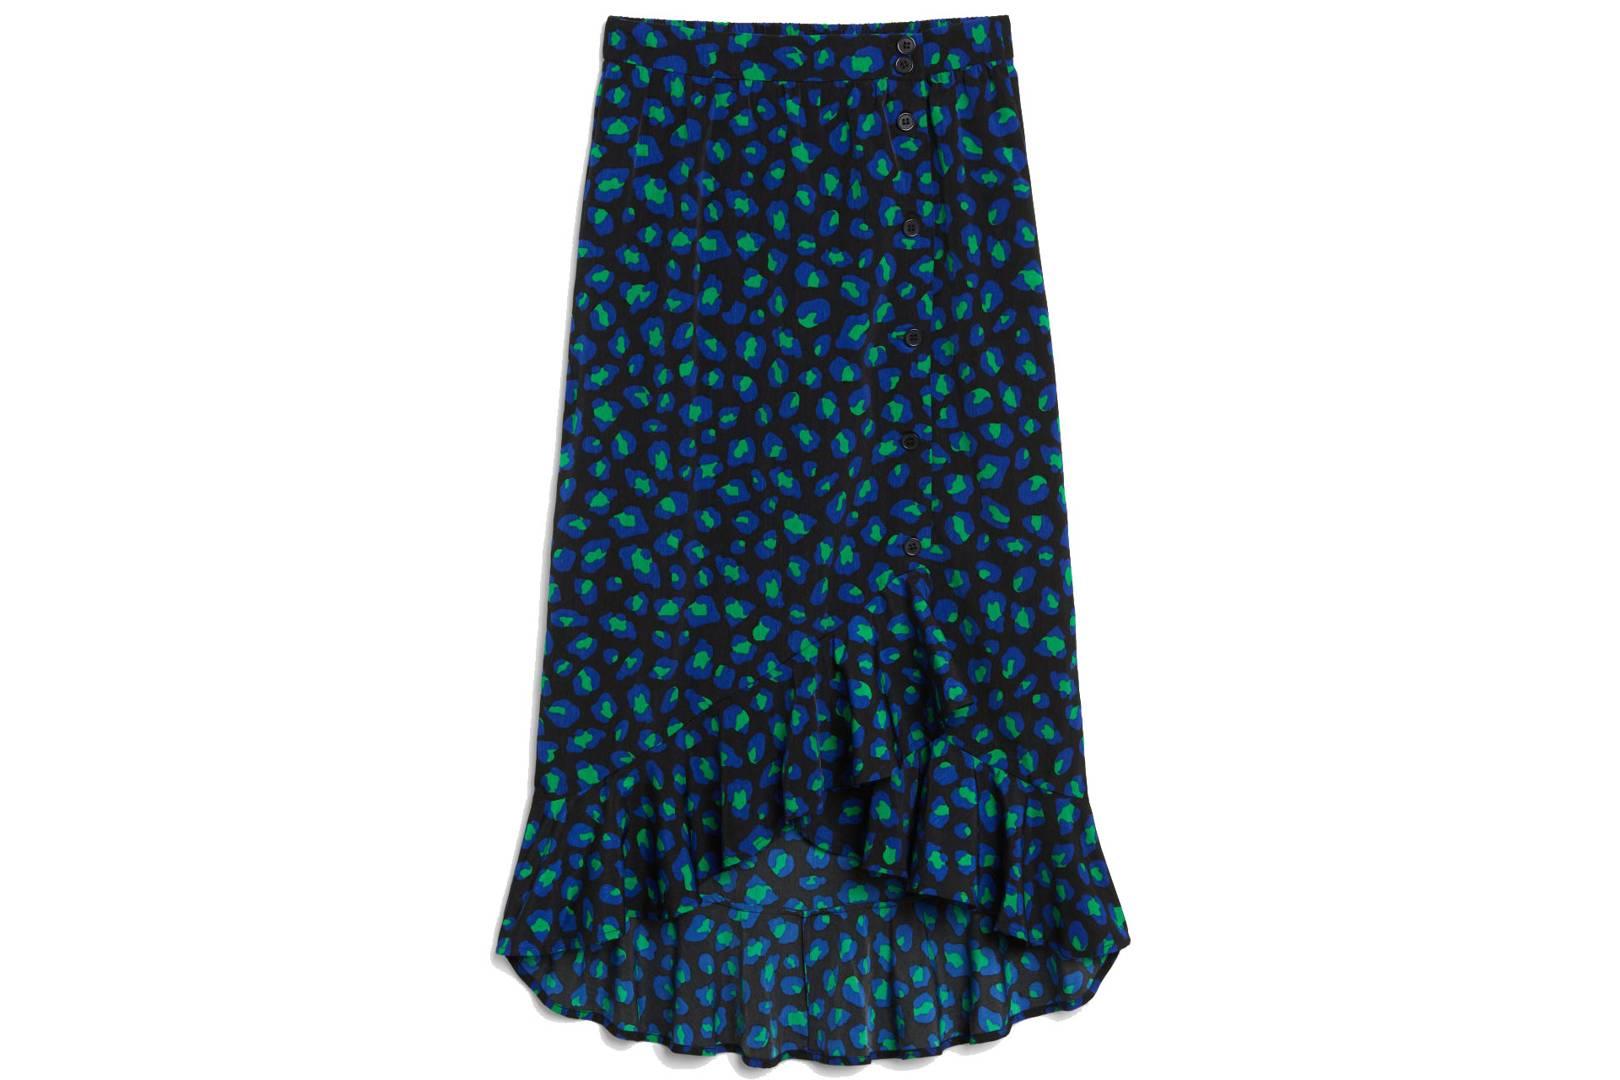 b6b25de48 The Best Midi Skirts To Buy Now   British Vogue